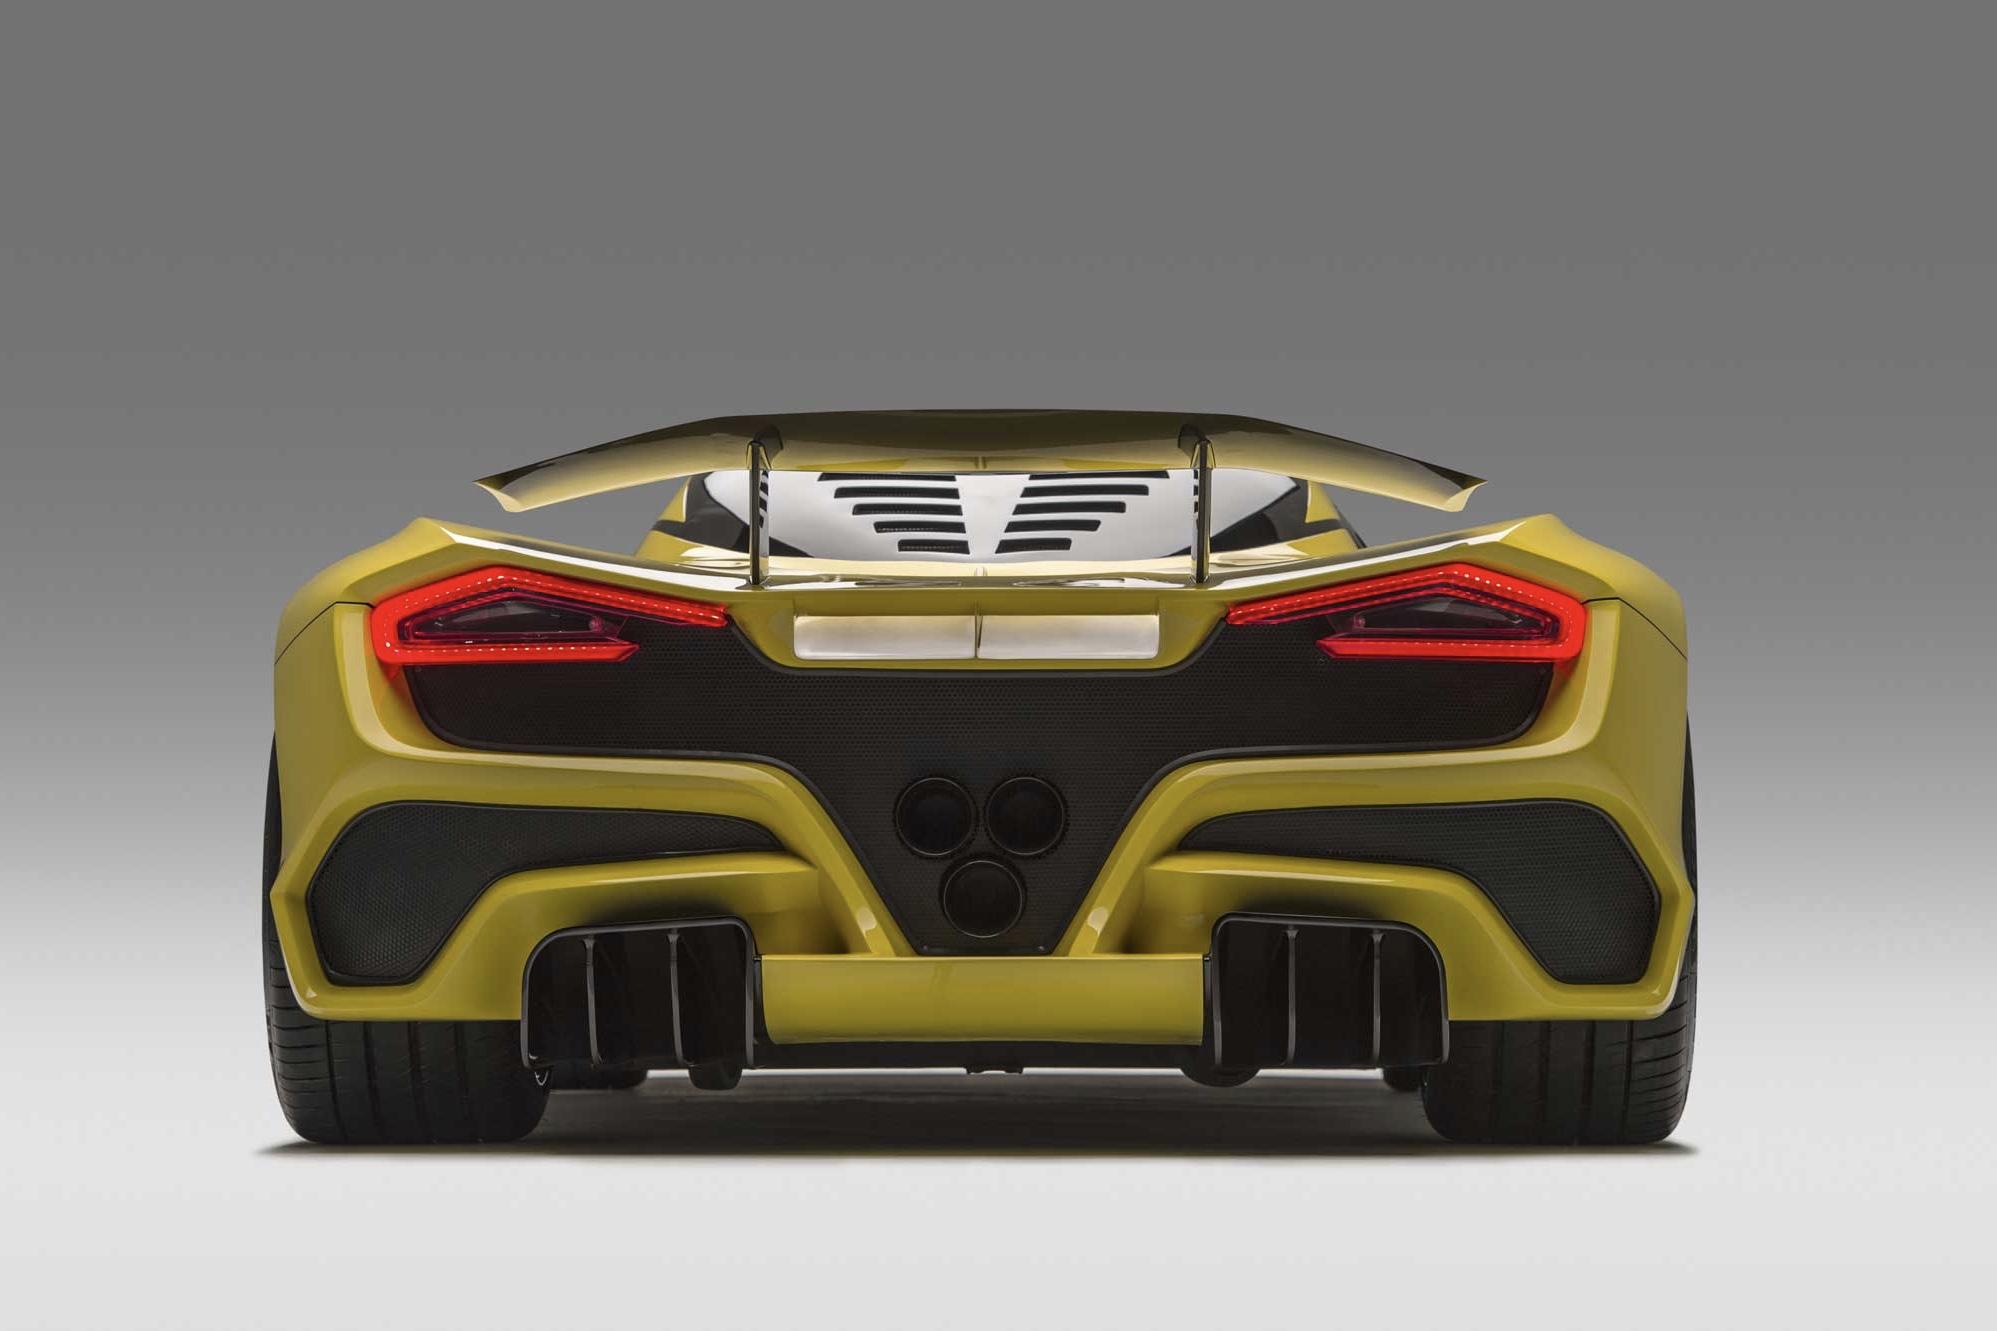 Video: The new 300mph Hennessey Venom F5 hypercar 1